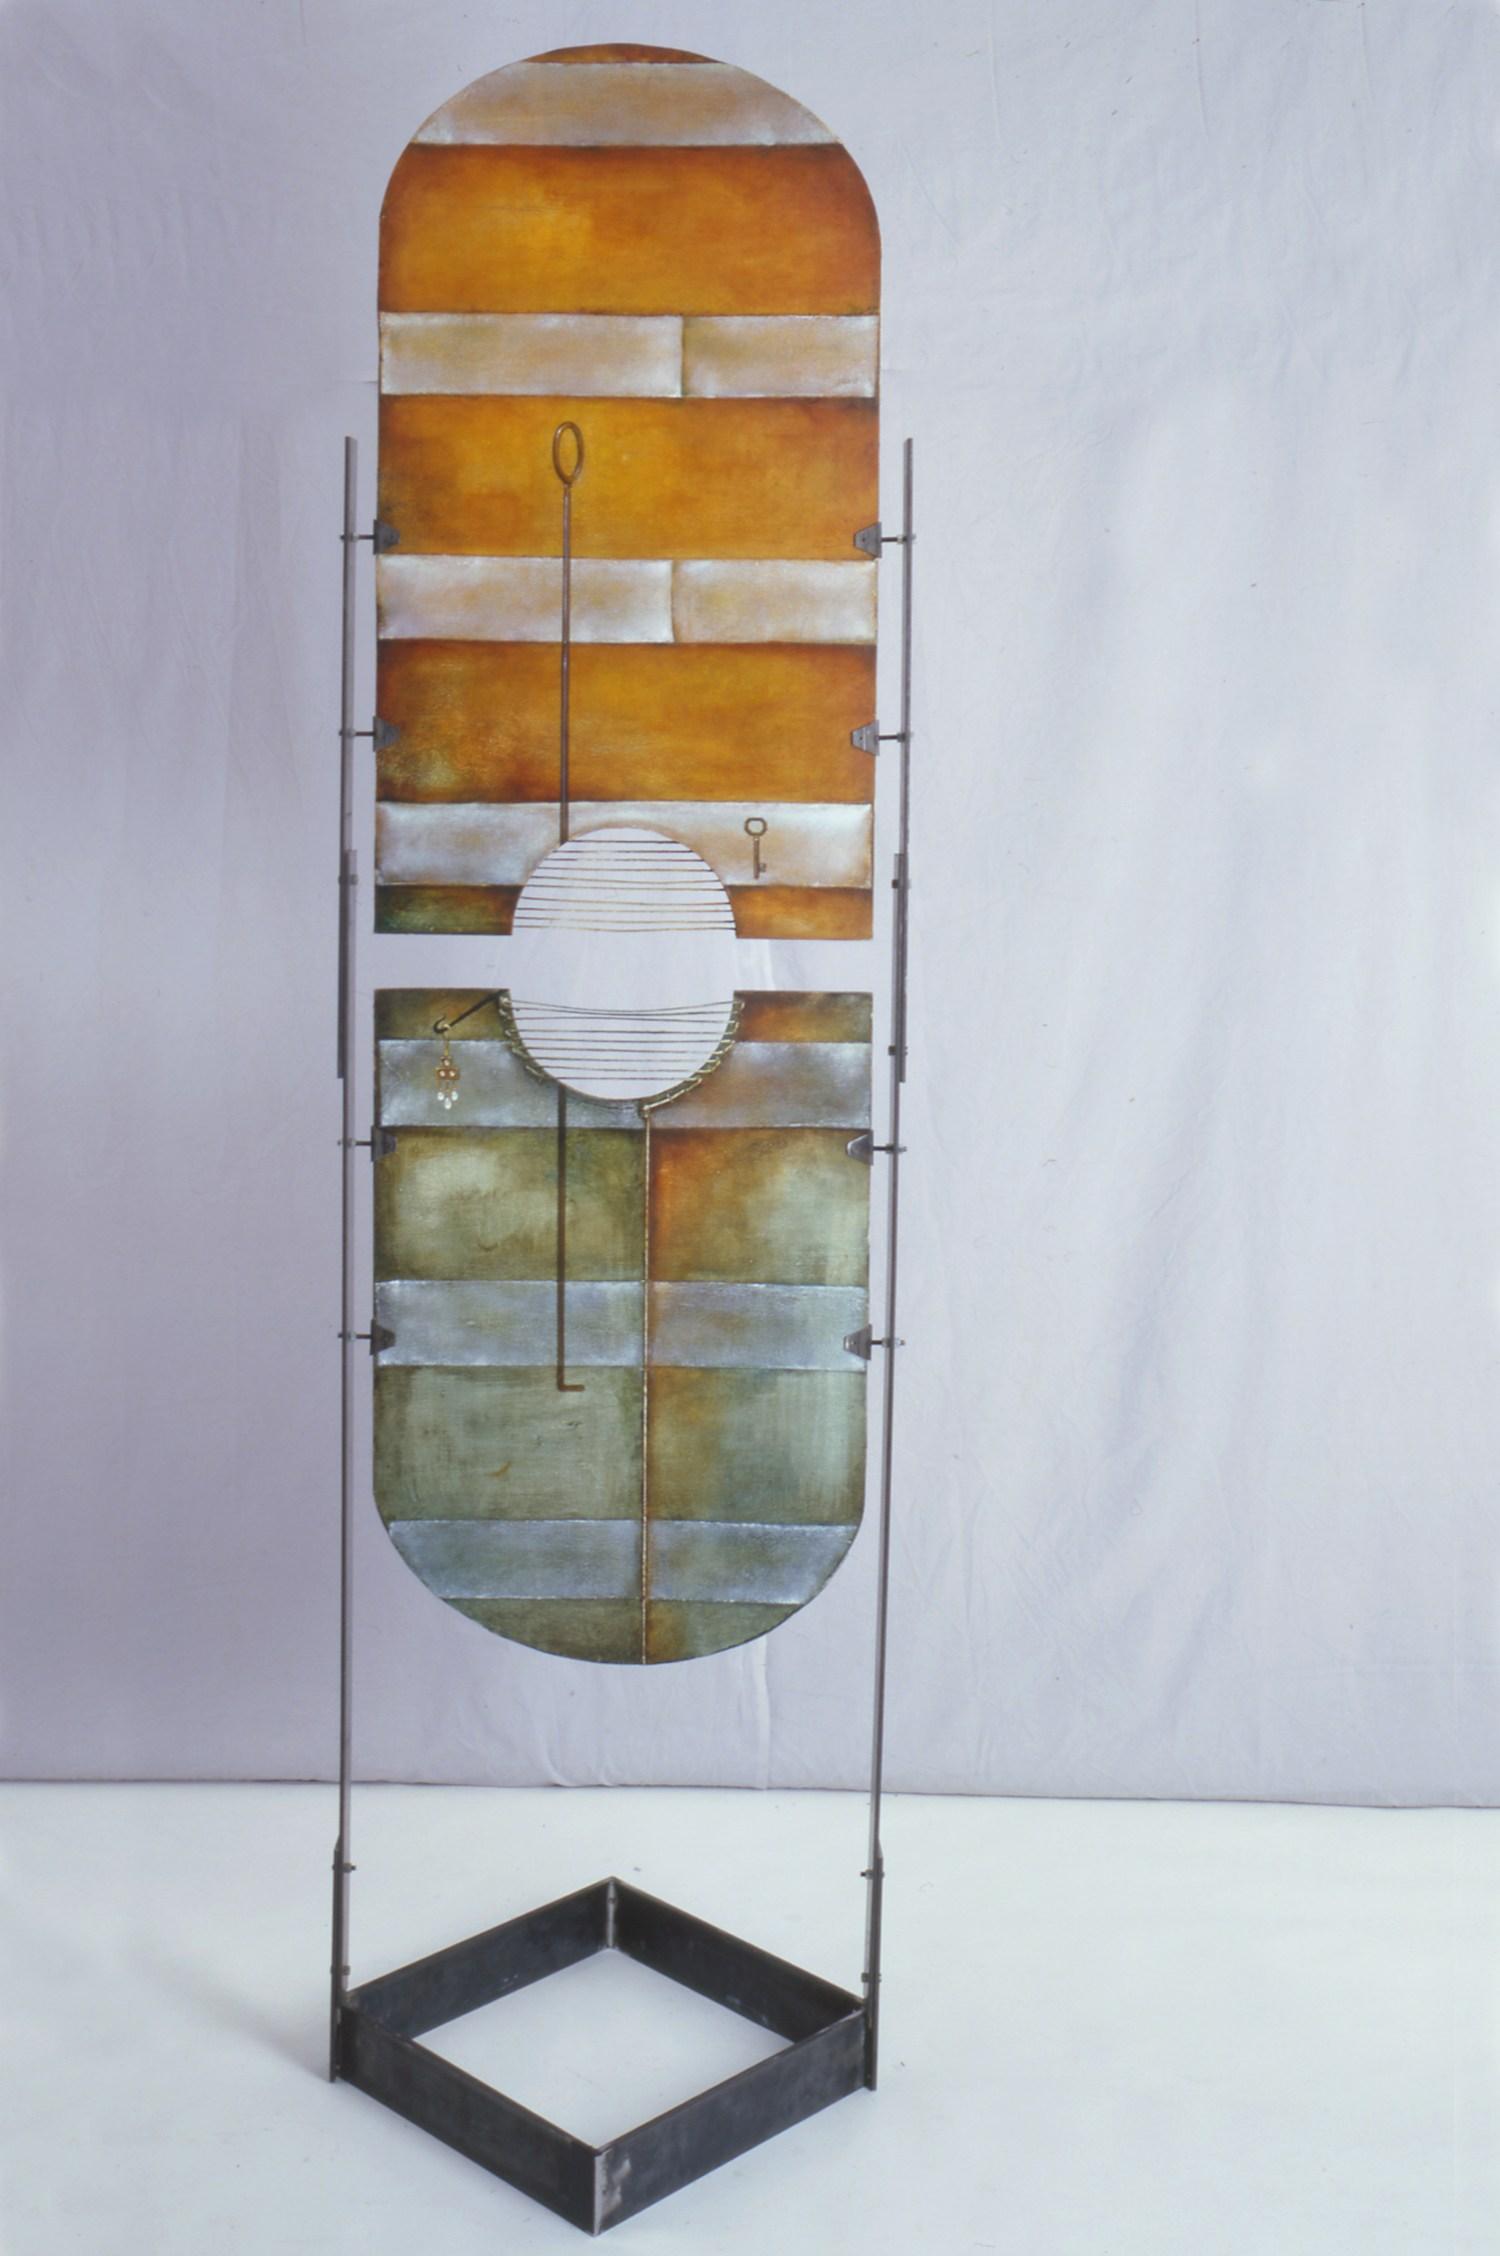 le-due-tavole-02-olio-tavola-e-ferro-57x75x210